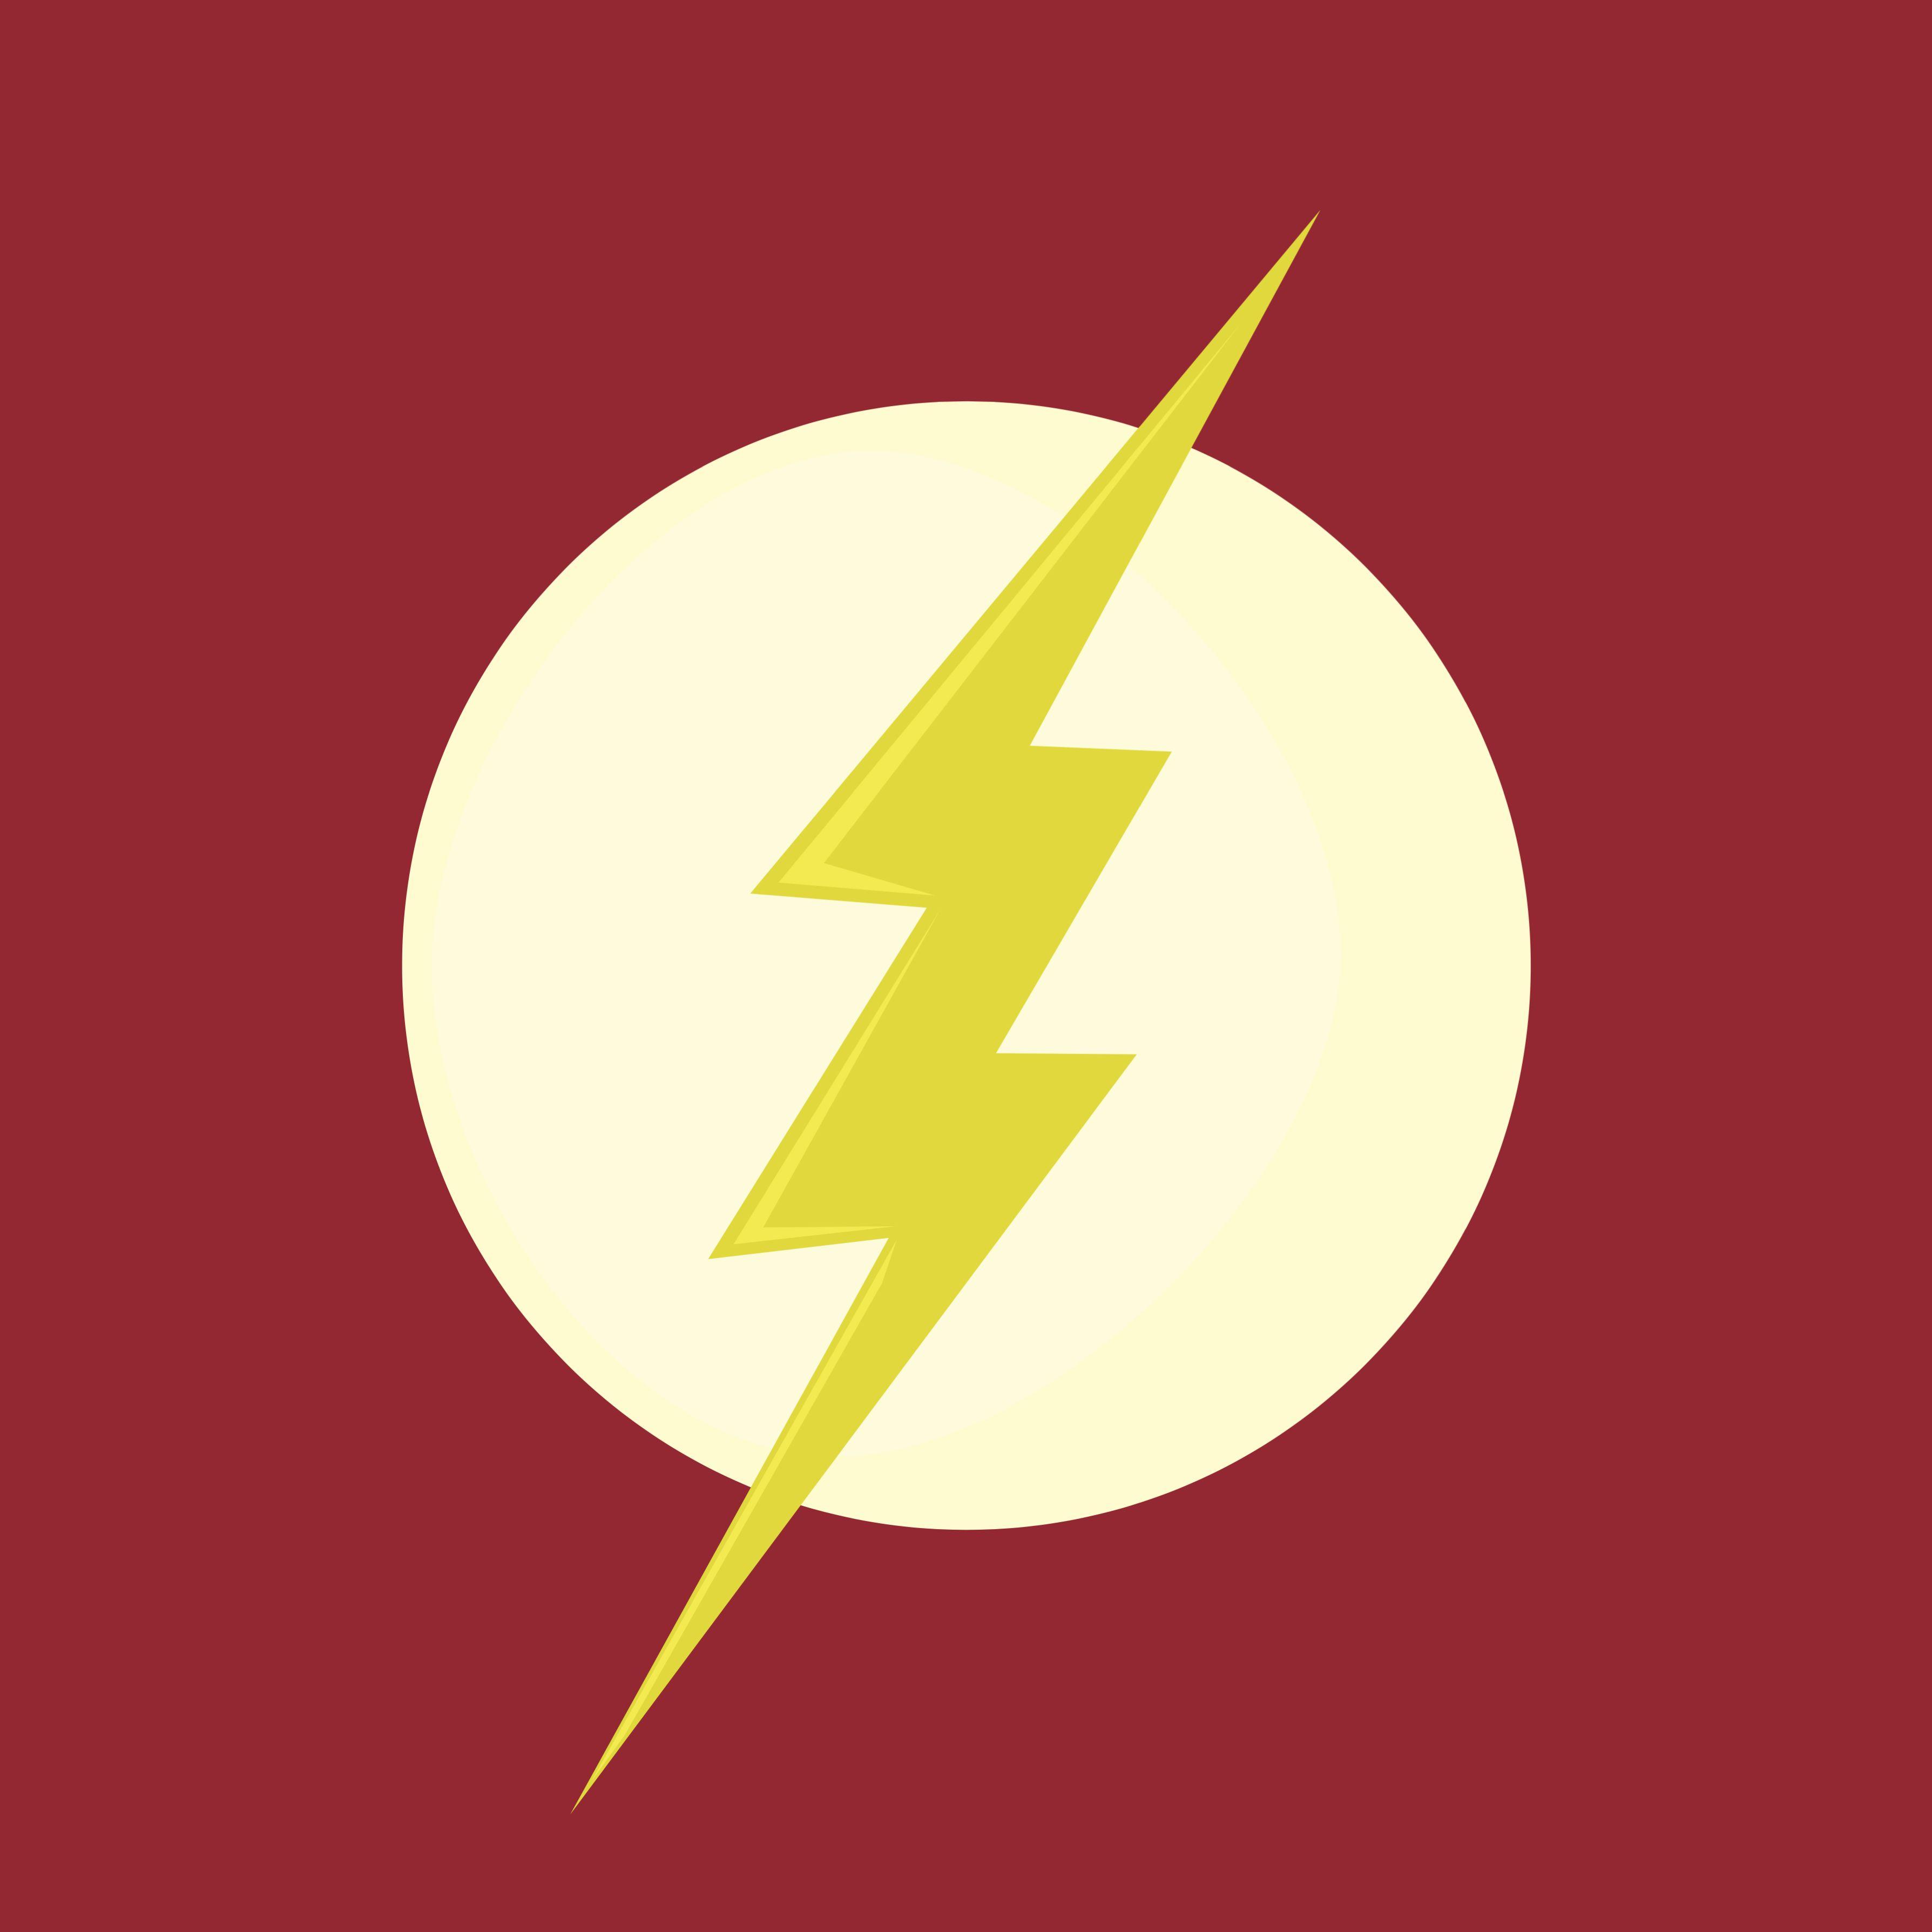 the flash logo designs my design done in adobe